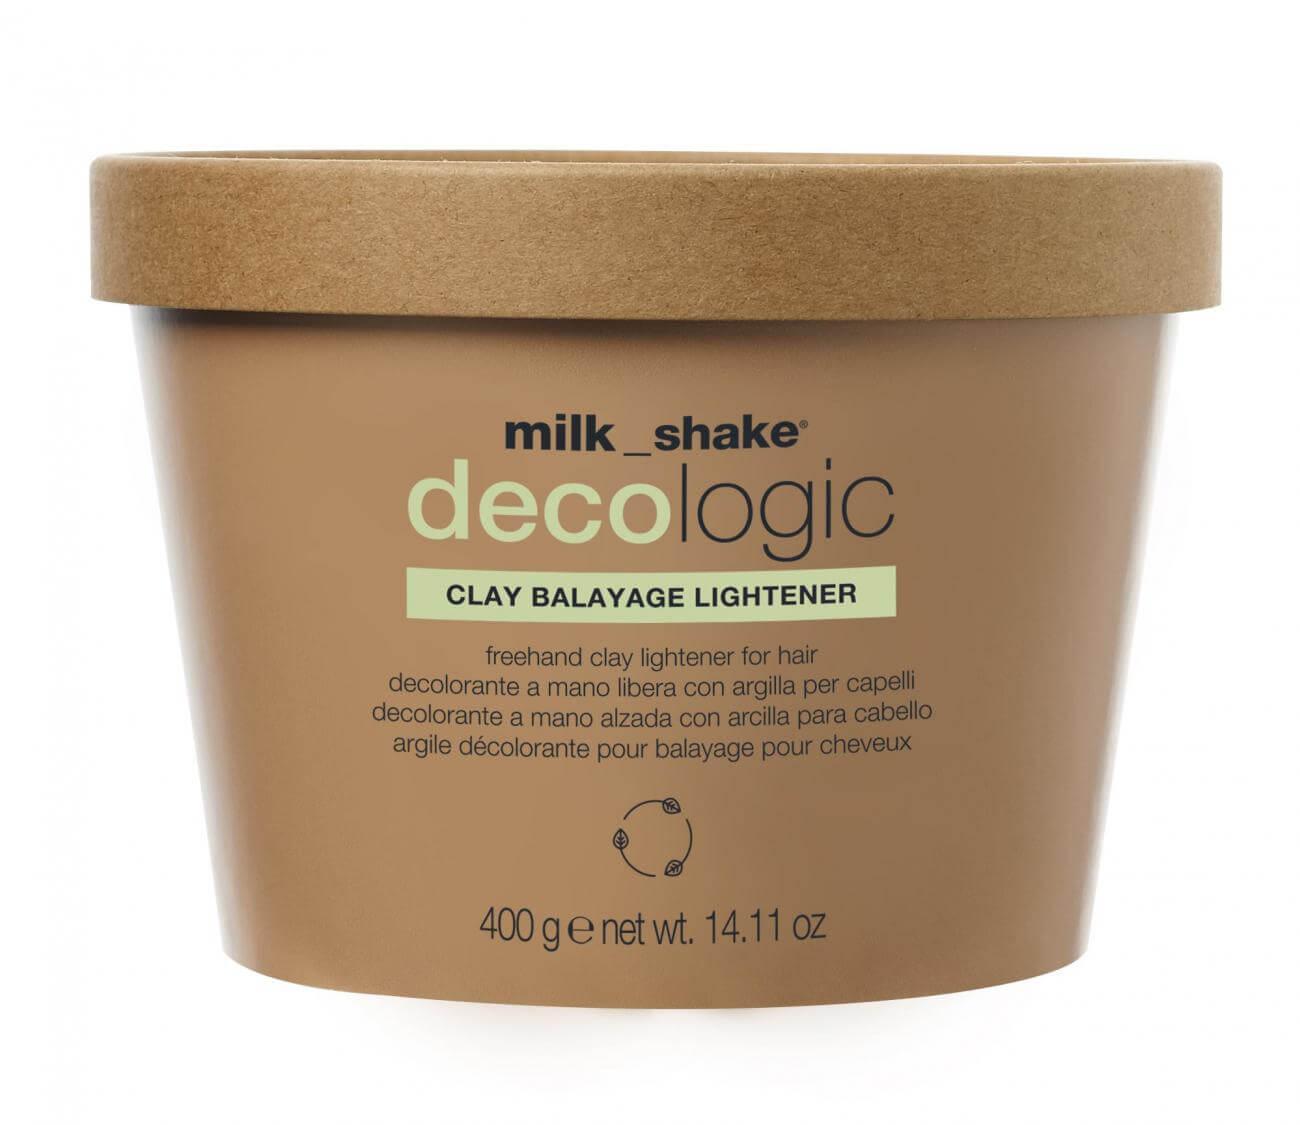 milk_shake DECOLOGIC ОСВЕТЛЯЮЩАЯ ГЛИНА ДЛЯ ВОЛОС 400 гр